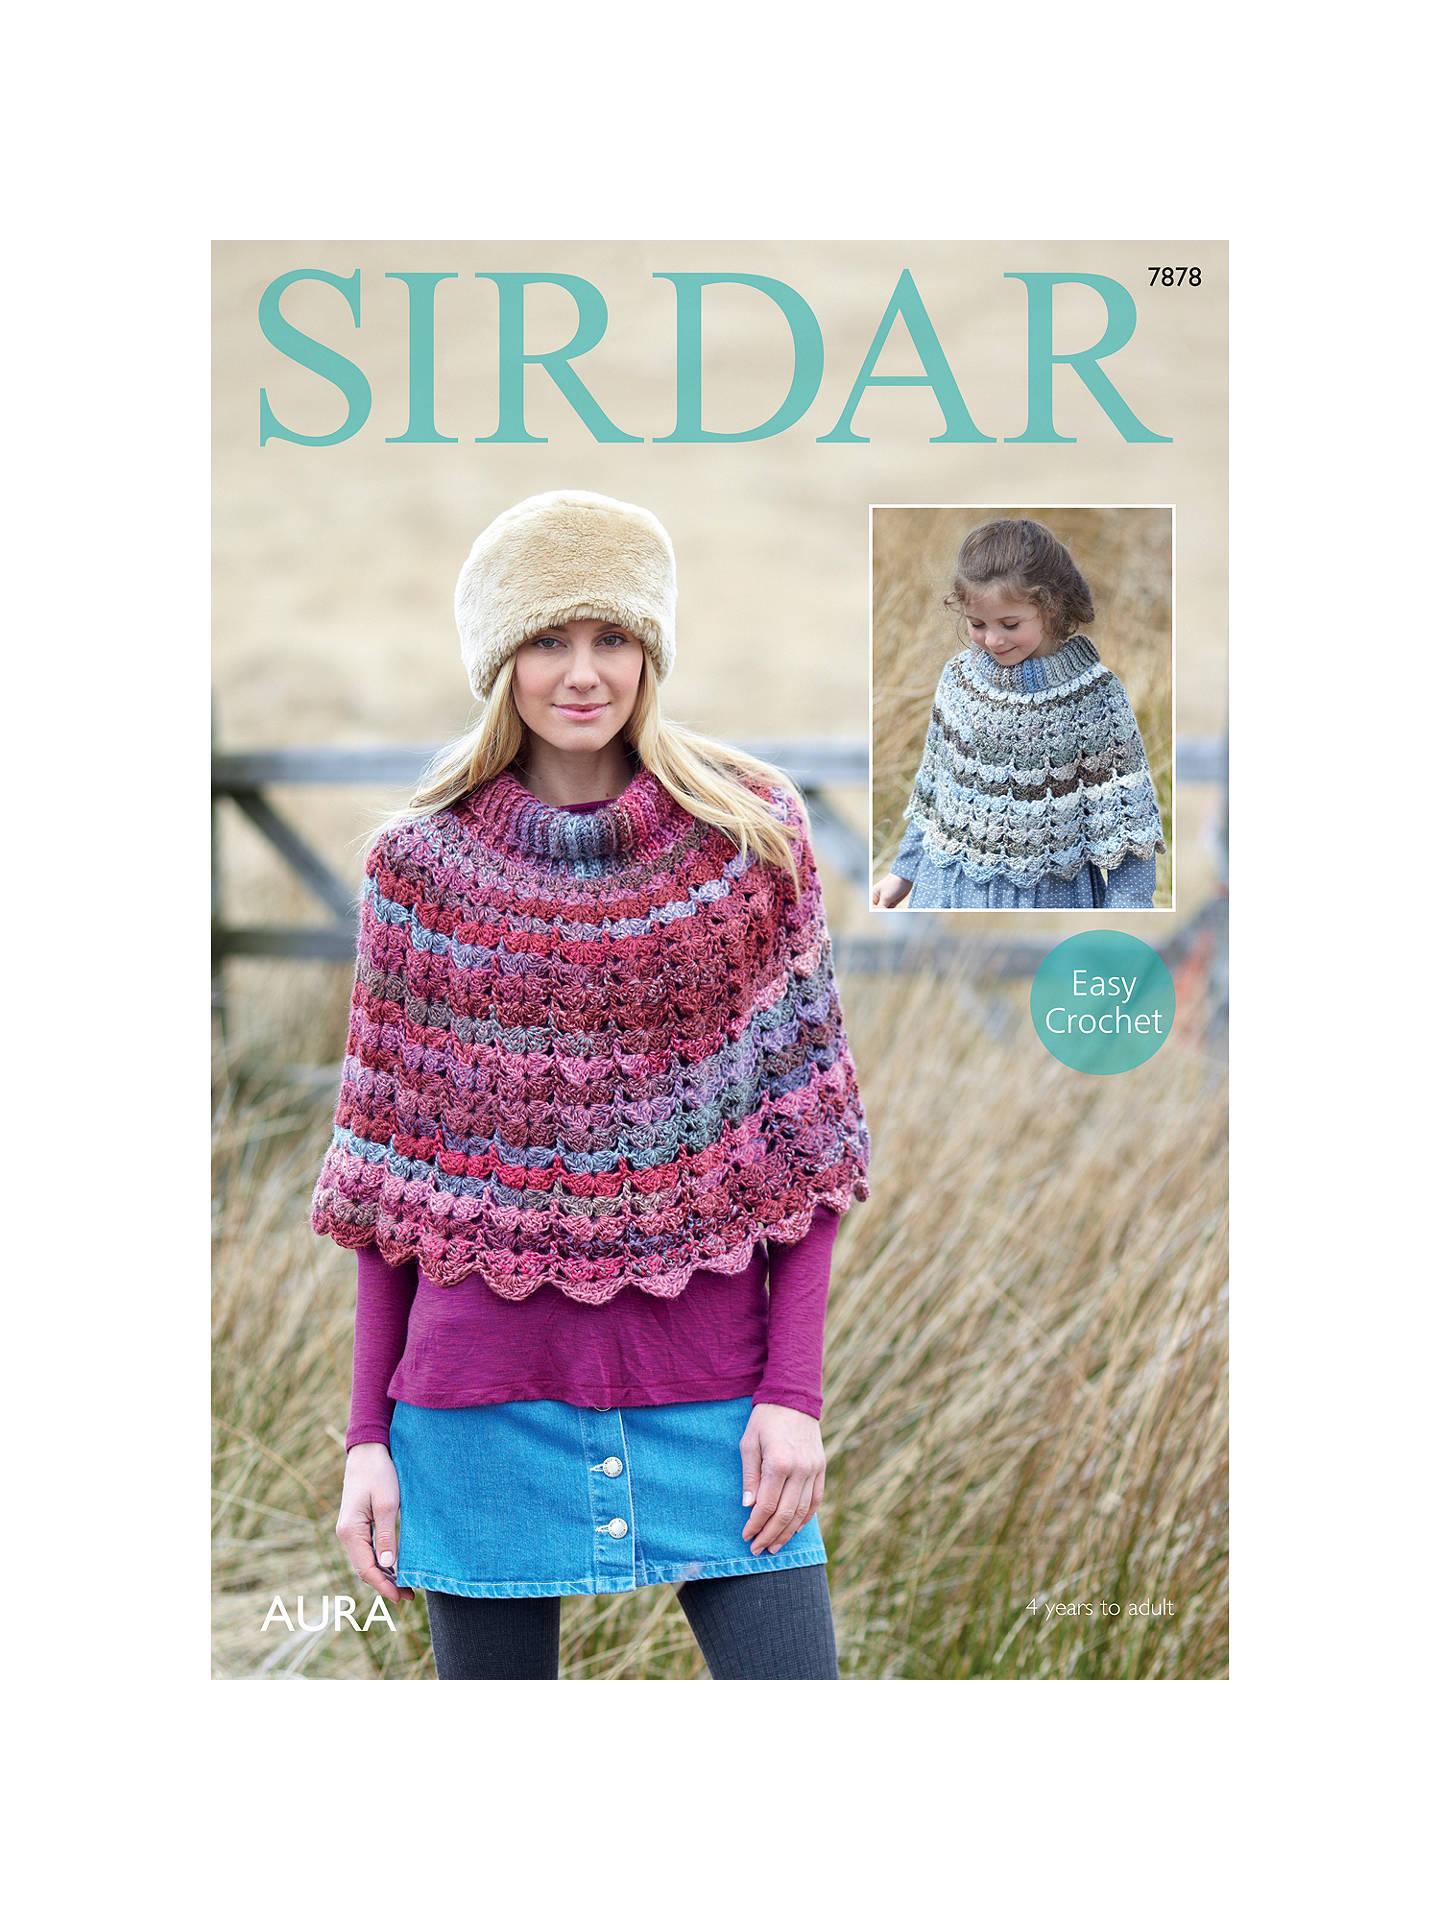 Sirdar Aura Chunky Poncho Crochet Pattern 7878 At John Lewis Partners